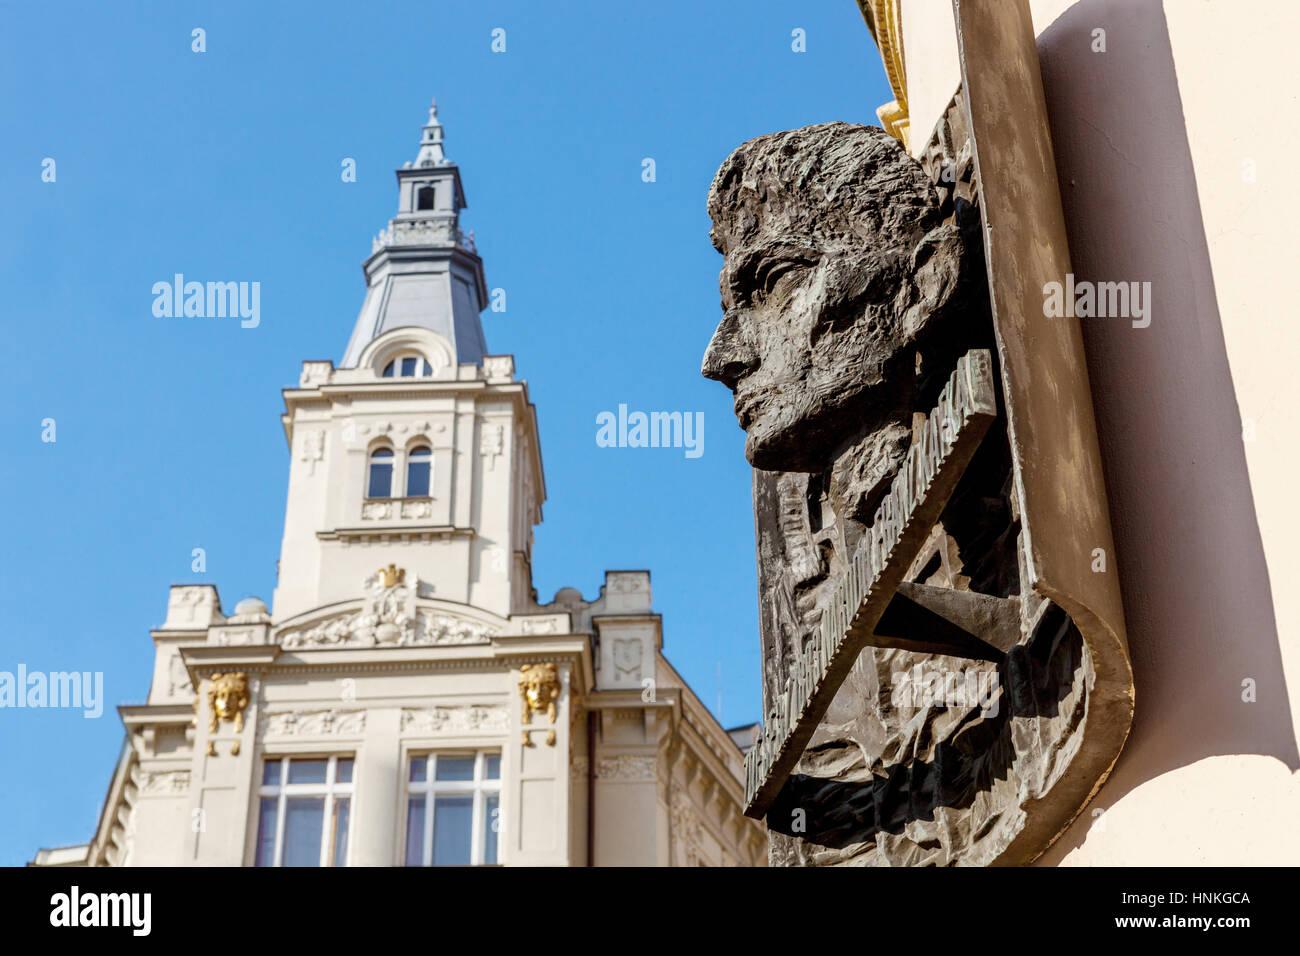 The bronze bust of Franz Kafka on the native house, Prague, Czech Republic Stock Photo